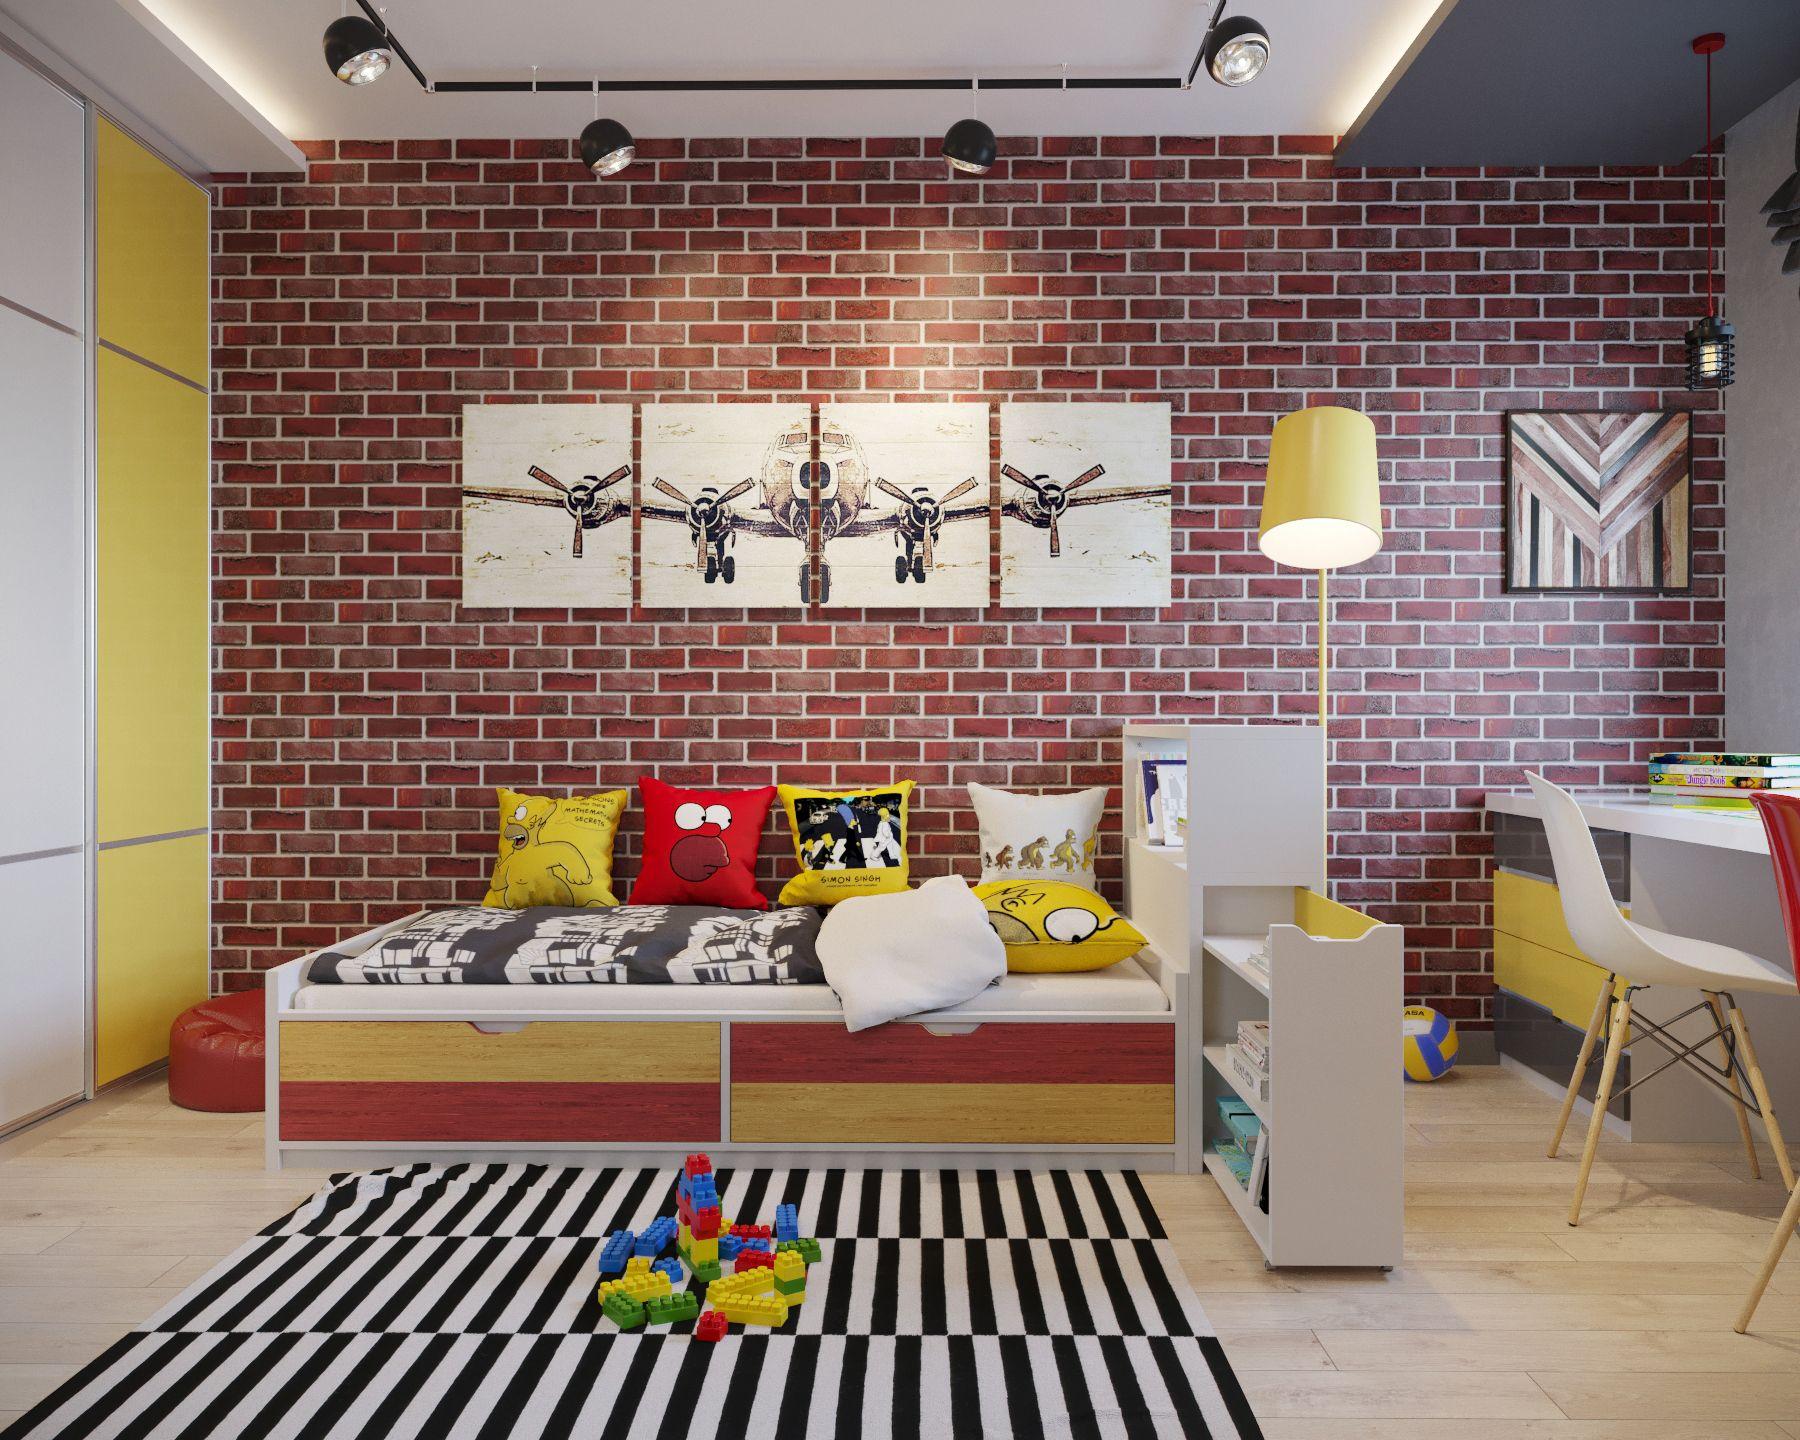 Https Www Behance Net Gallery 55872577 Child Room Com Imagens